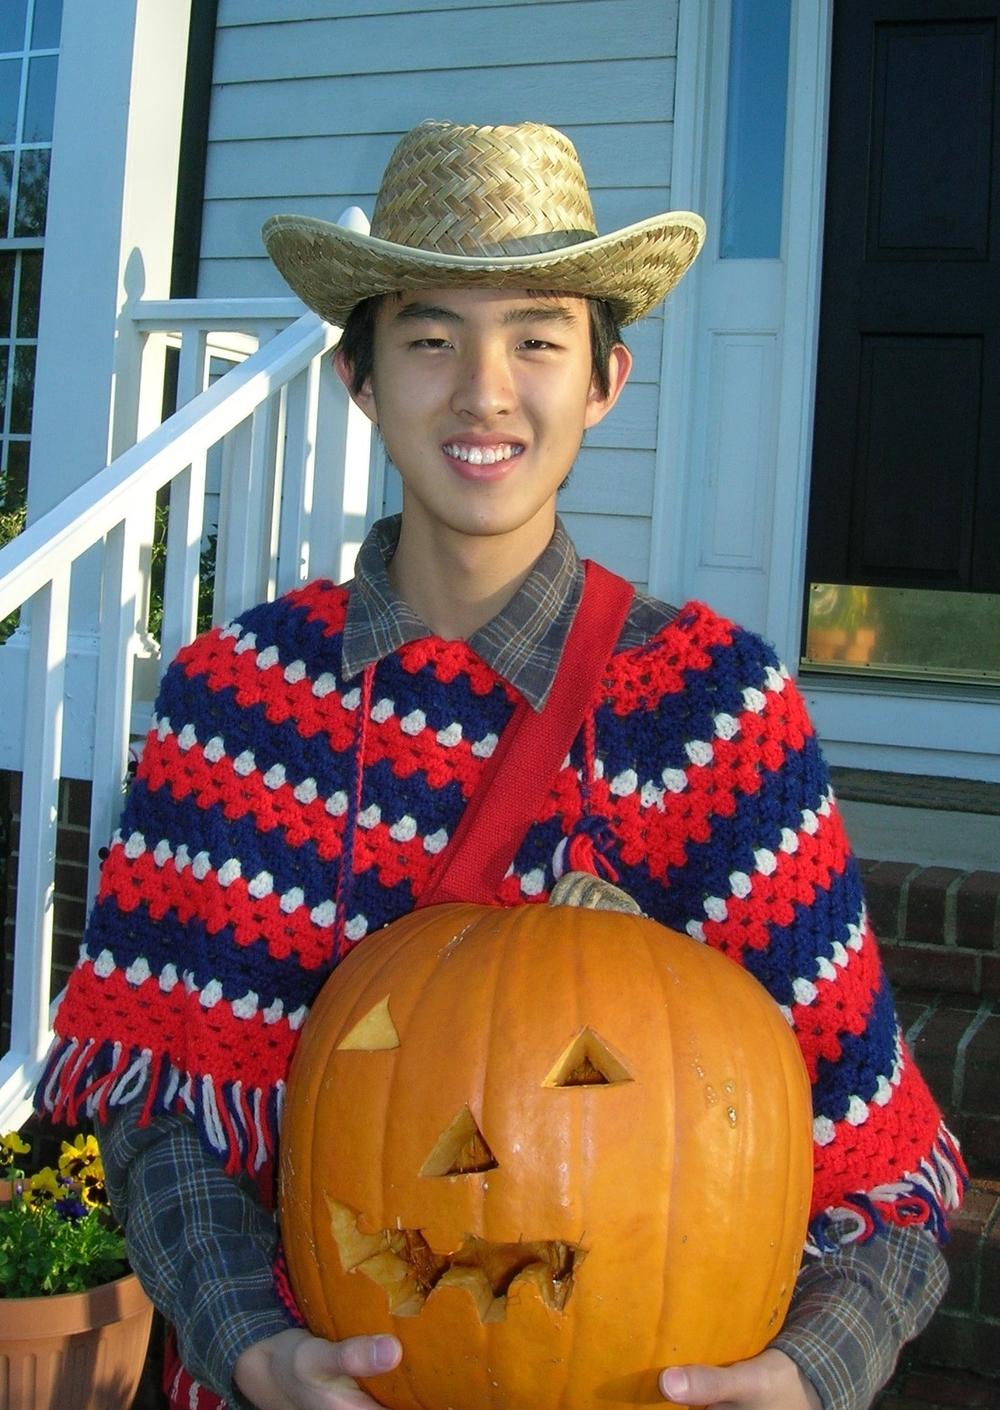 Cowboy James with jack-o-lantern